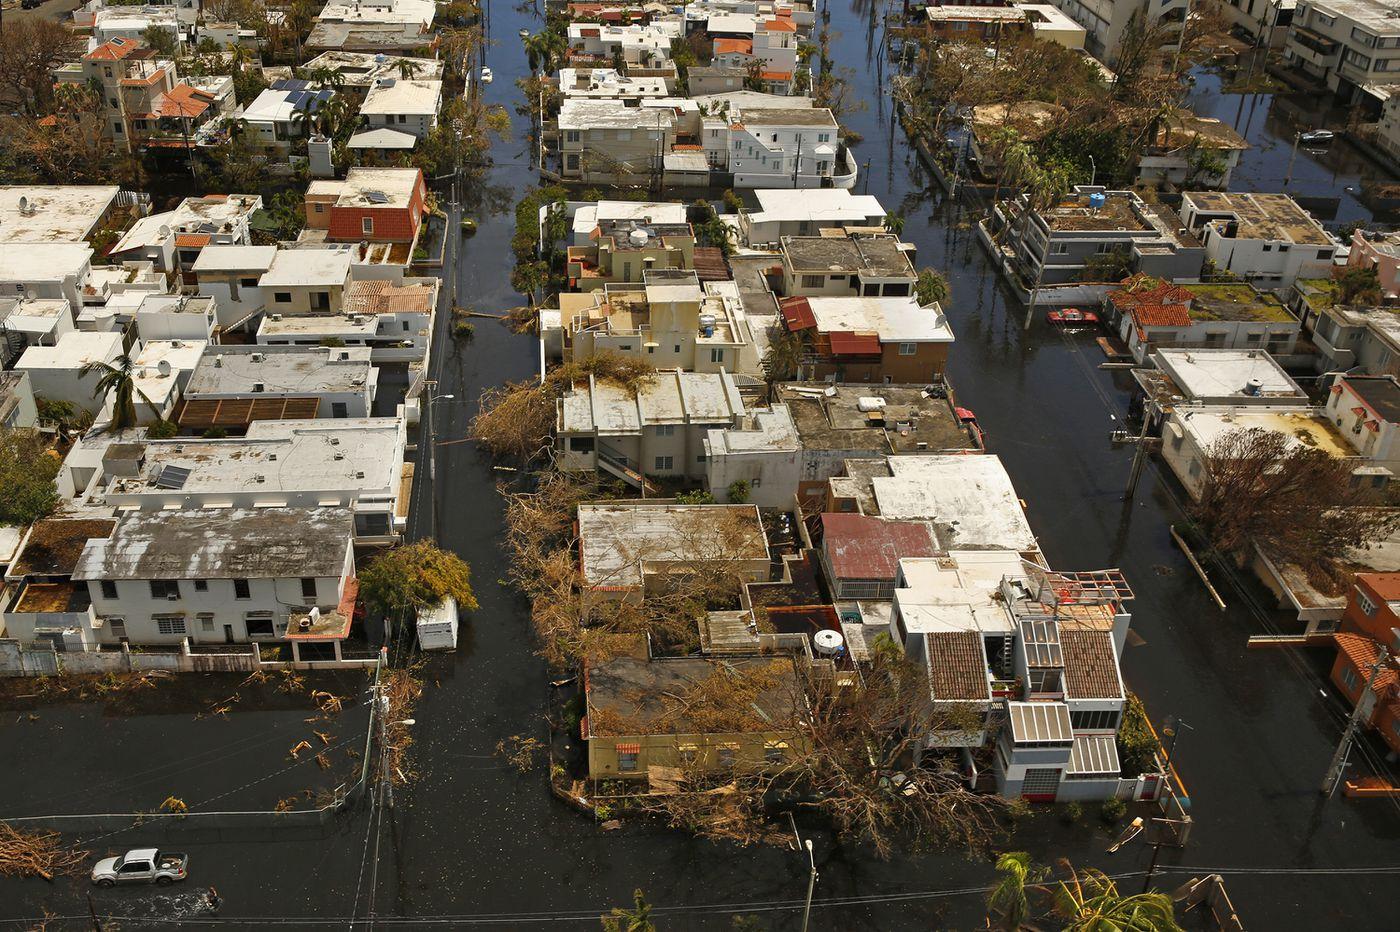 Puerto Rico's new fiscal plan: Certain pain, uncertain gain | Opinion